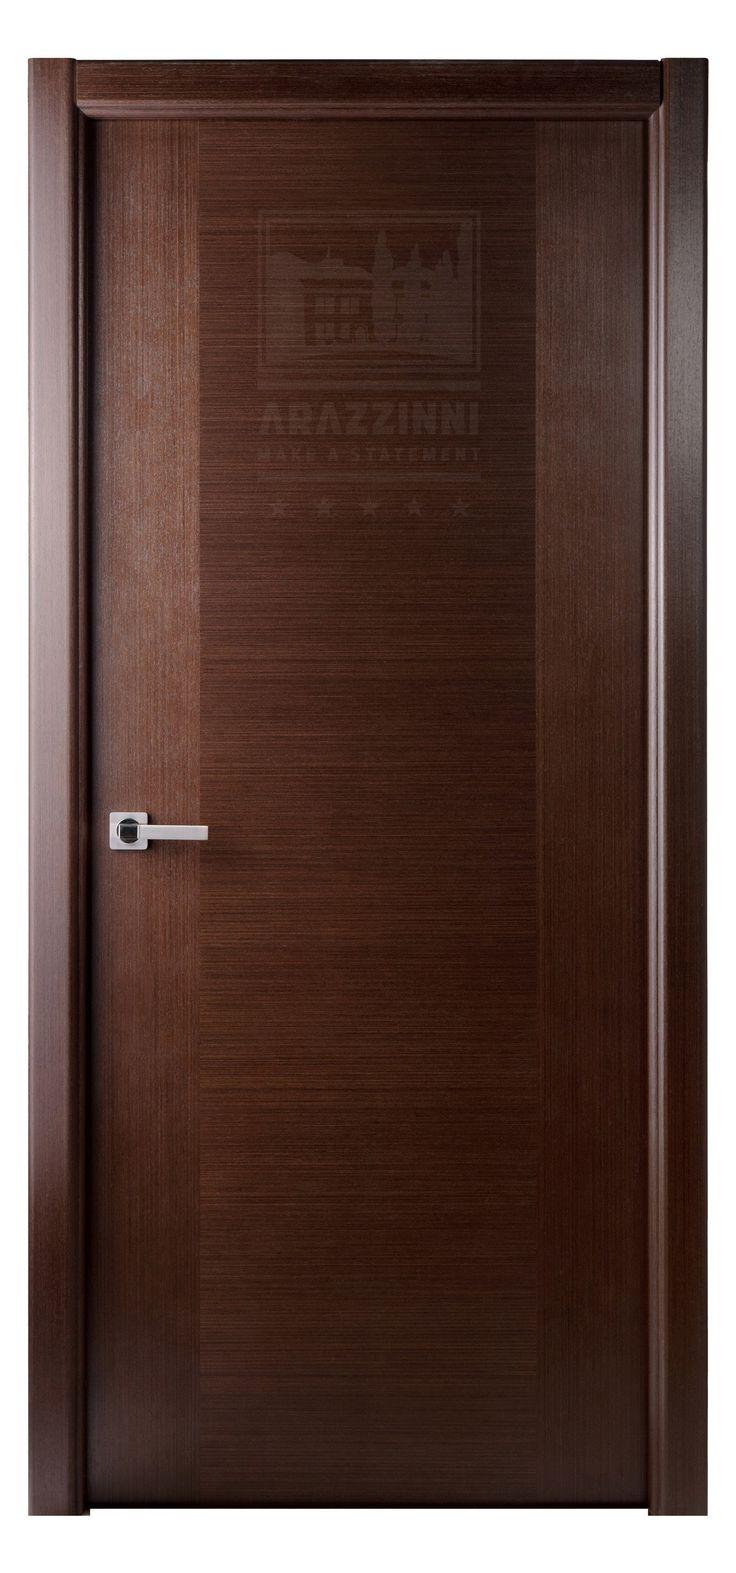 Arazzinni Classica Lux Interior Door Wenge